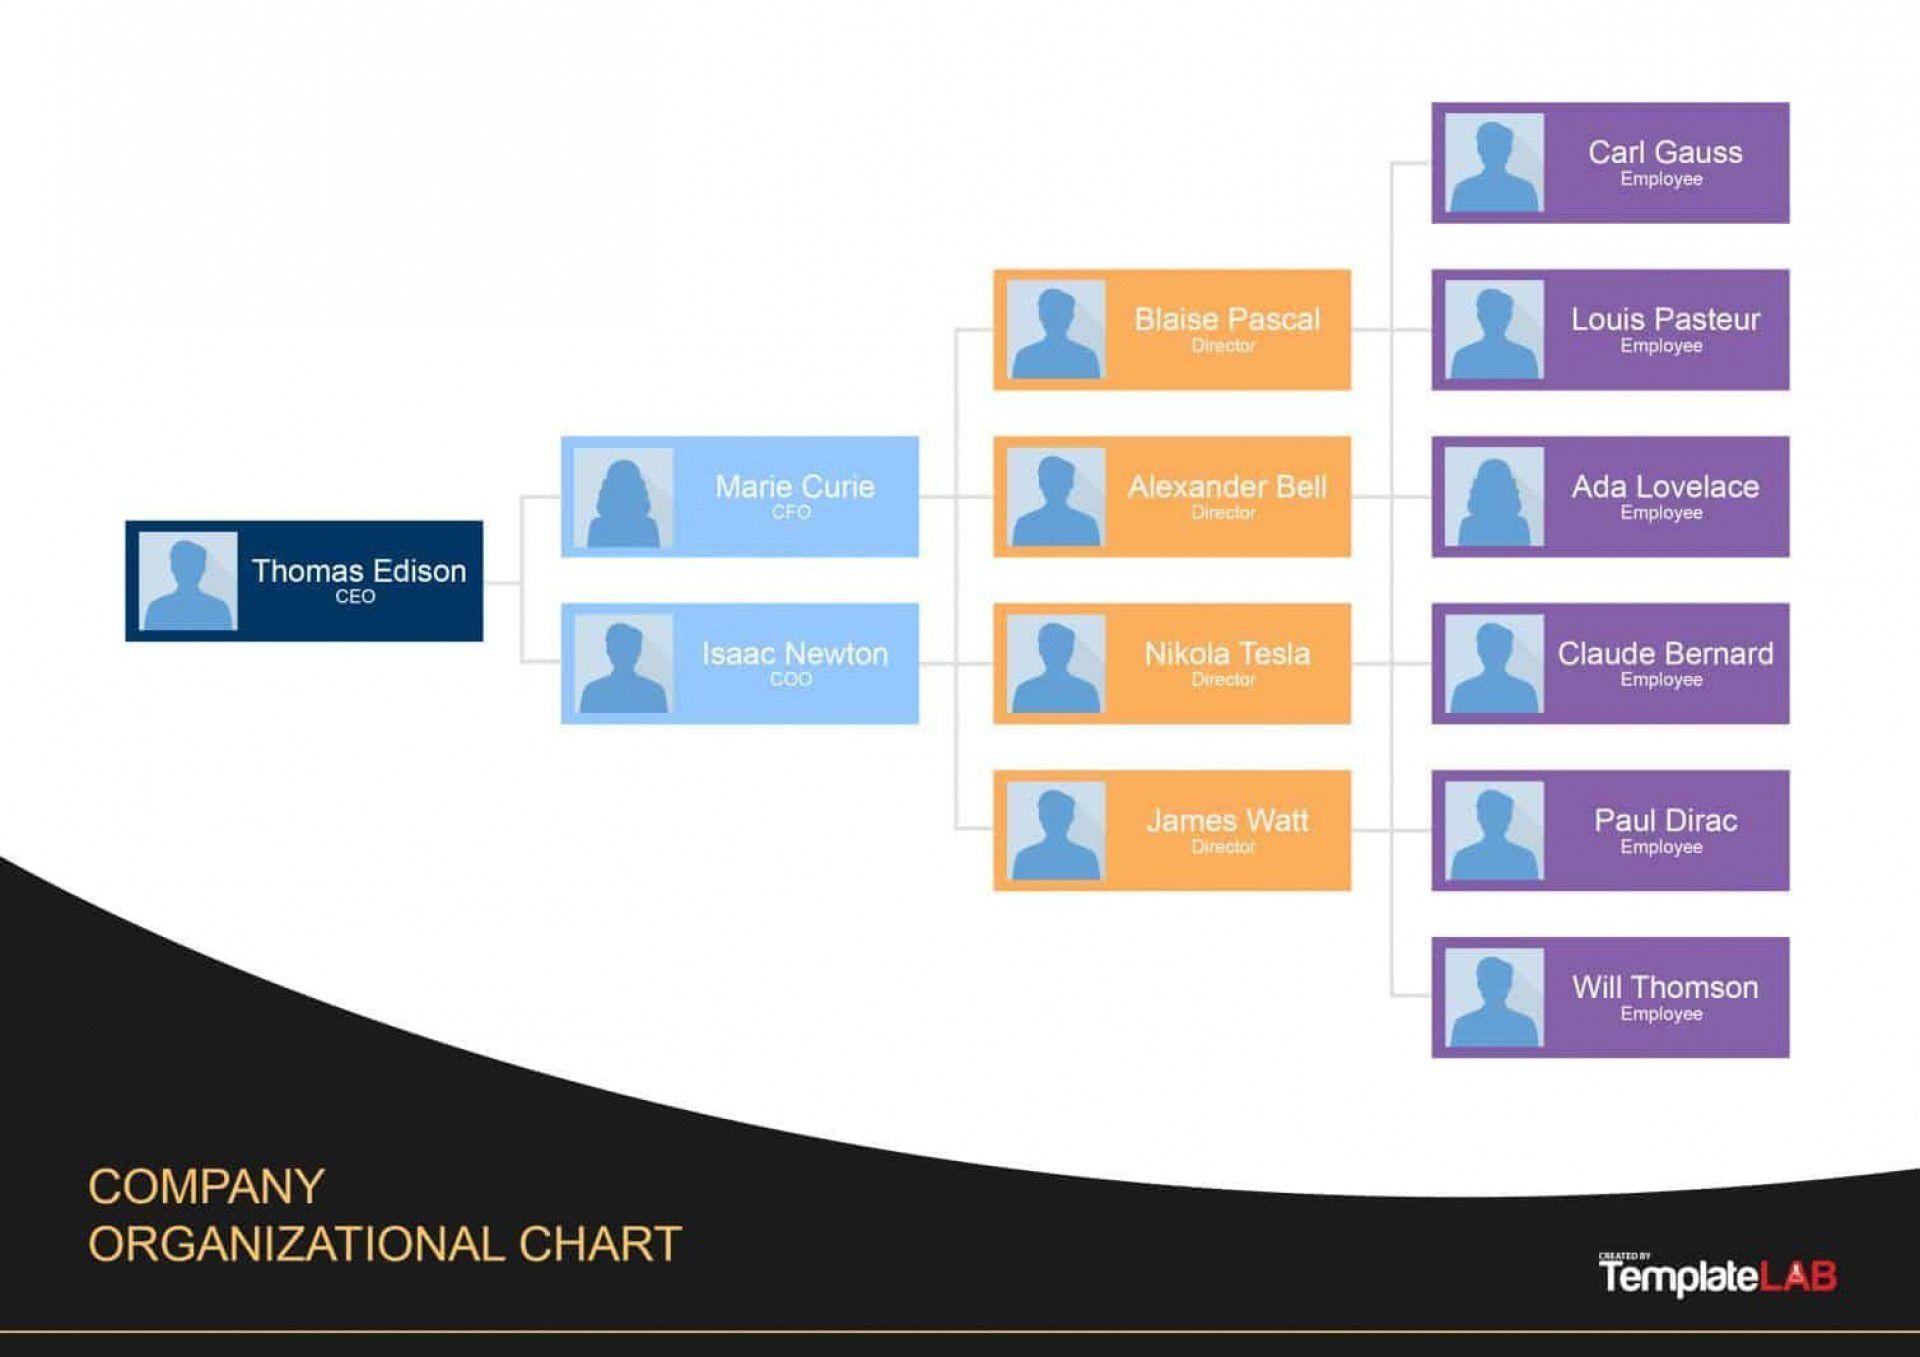 004 Frightening Microsoft Office Organizational Chart Template 2010 Inspiration Full